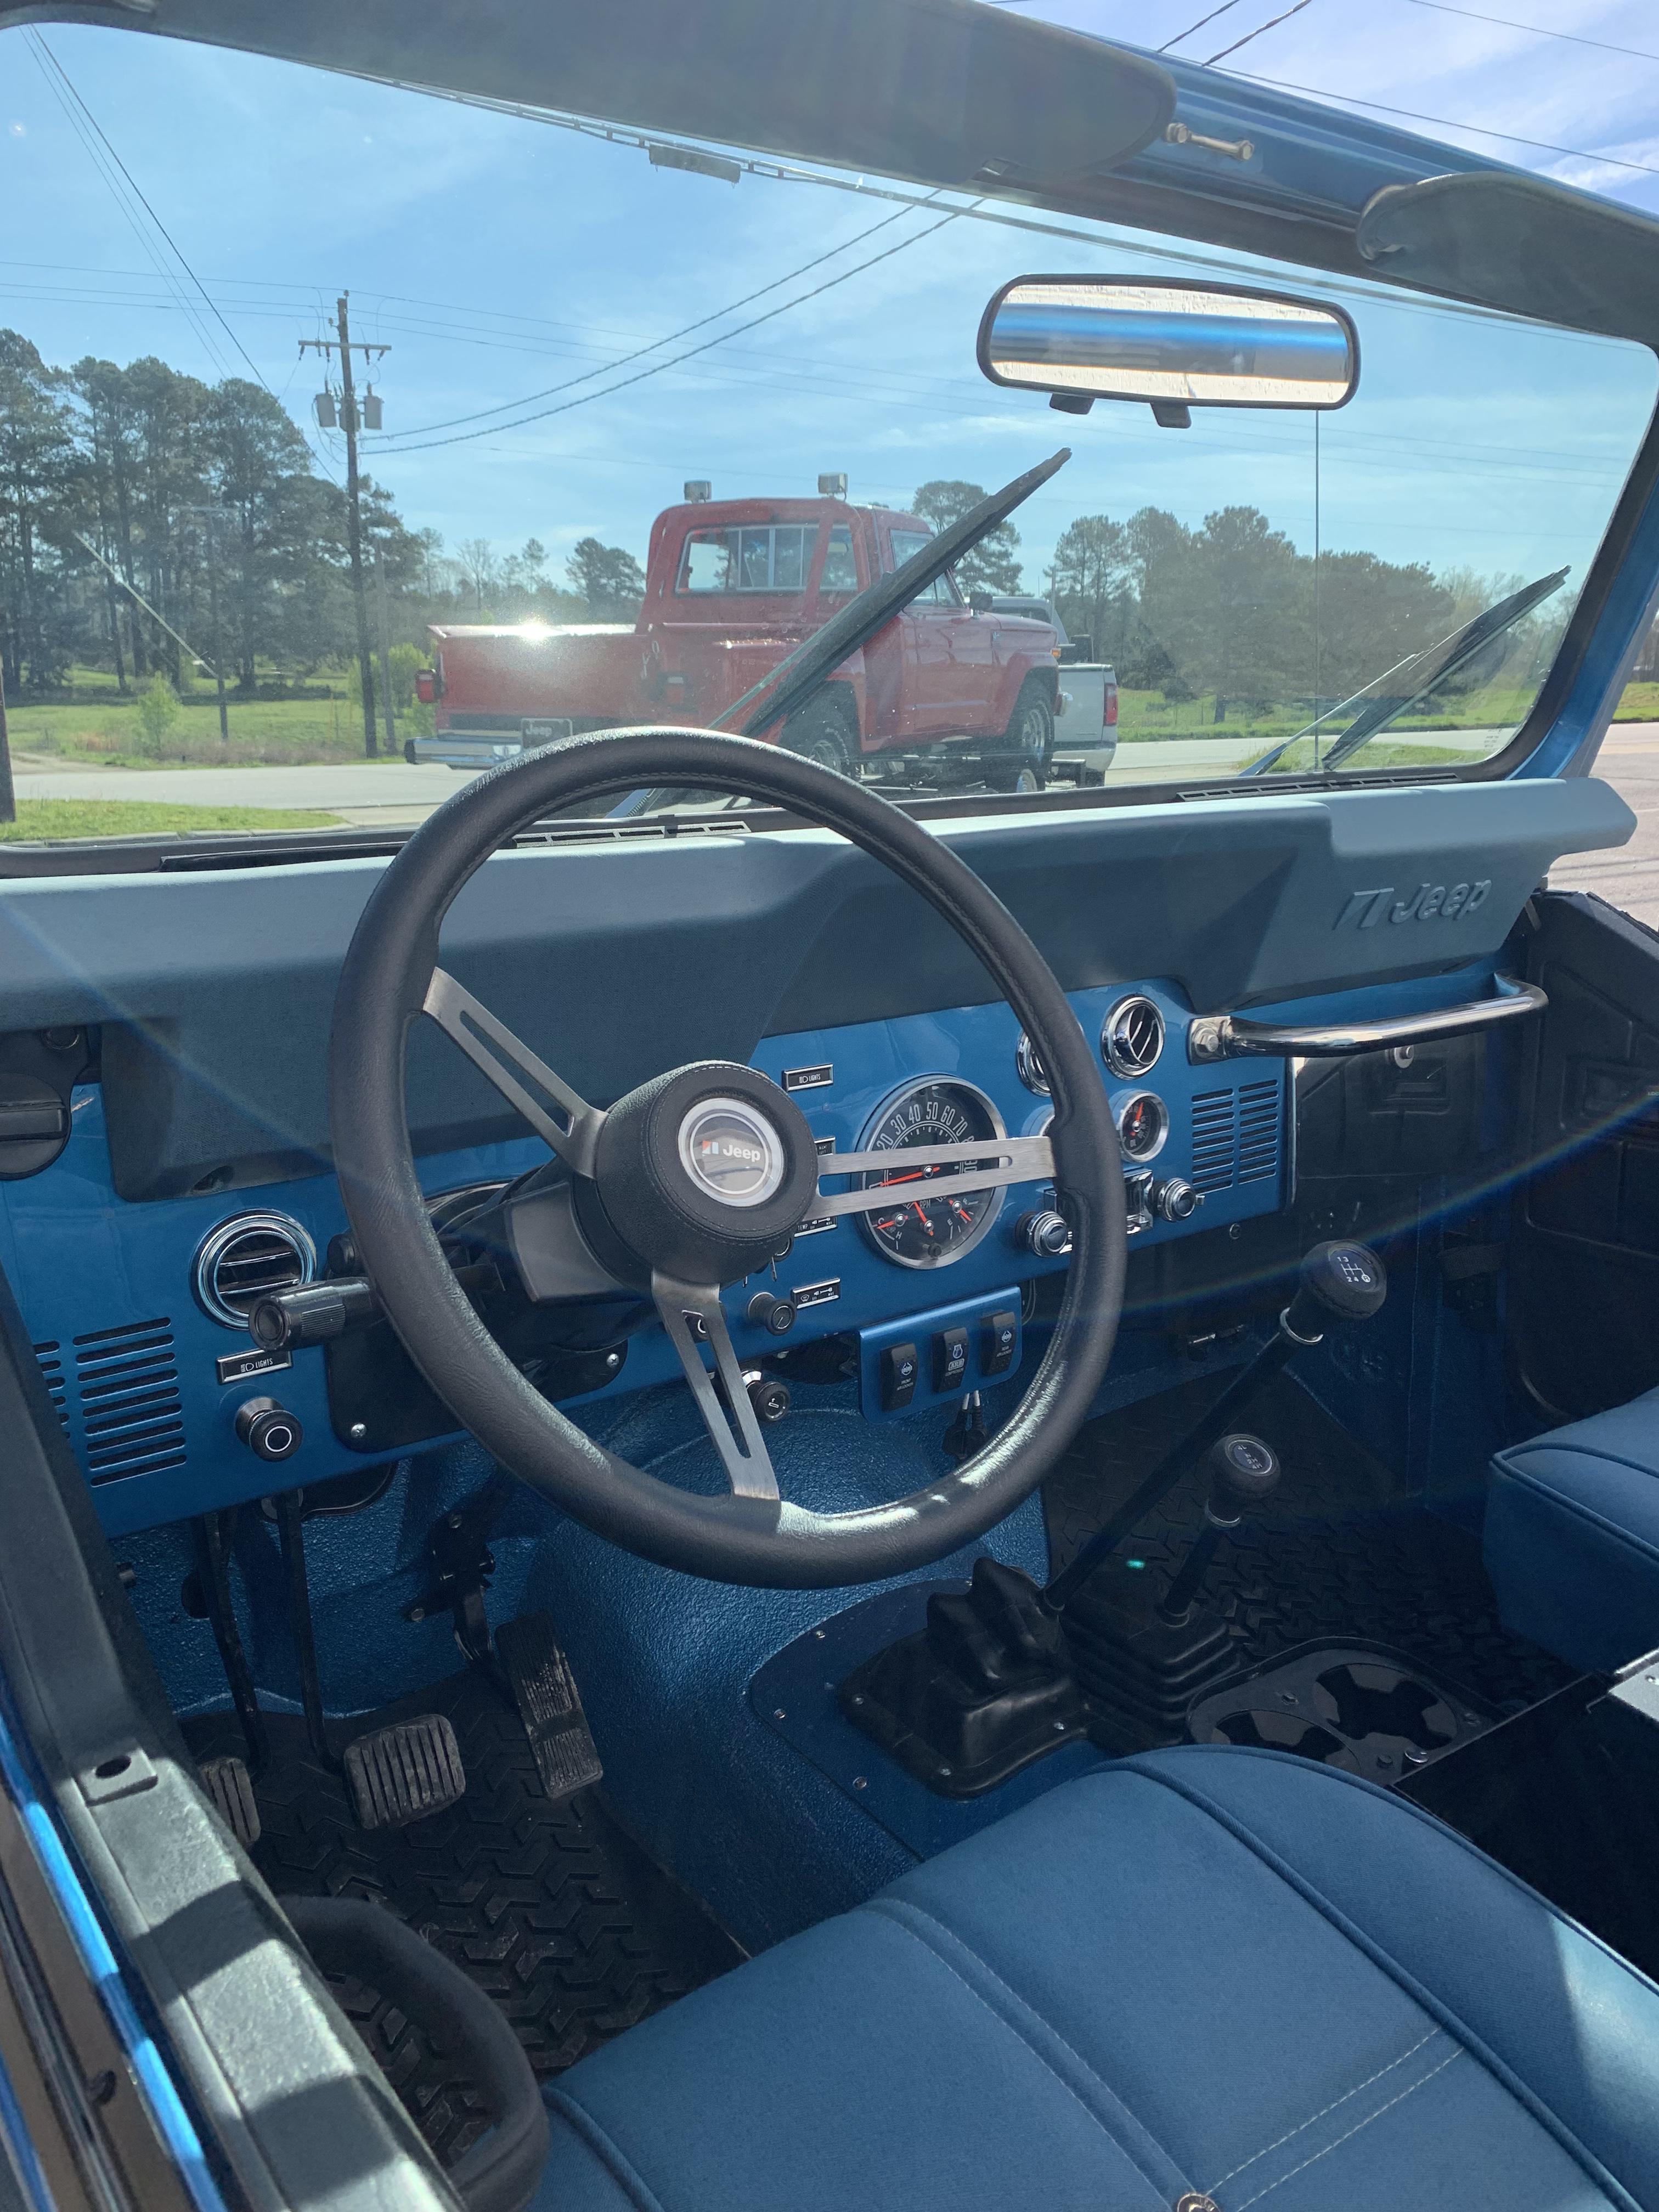 1978 Cj7 Blue Thumbnail